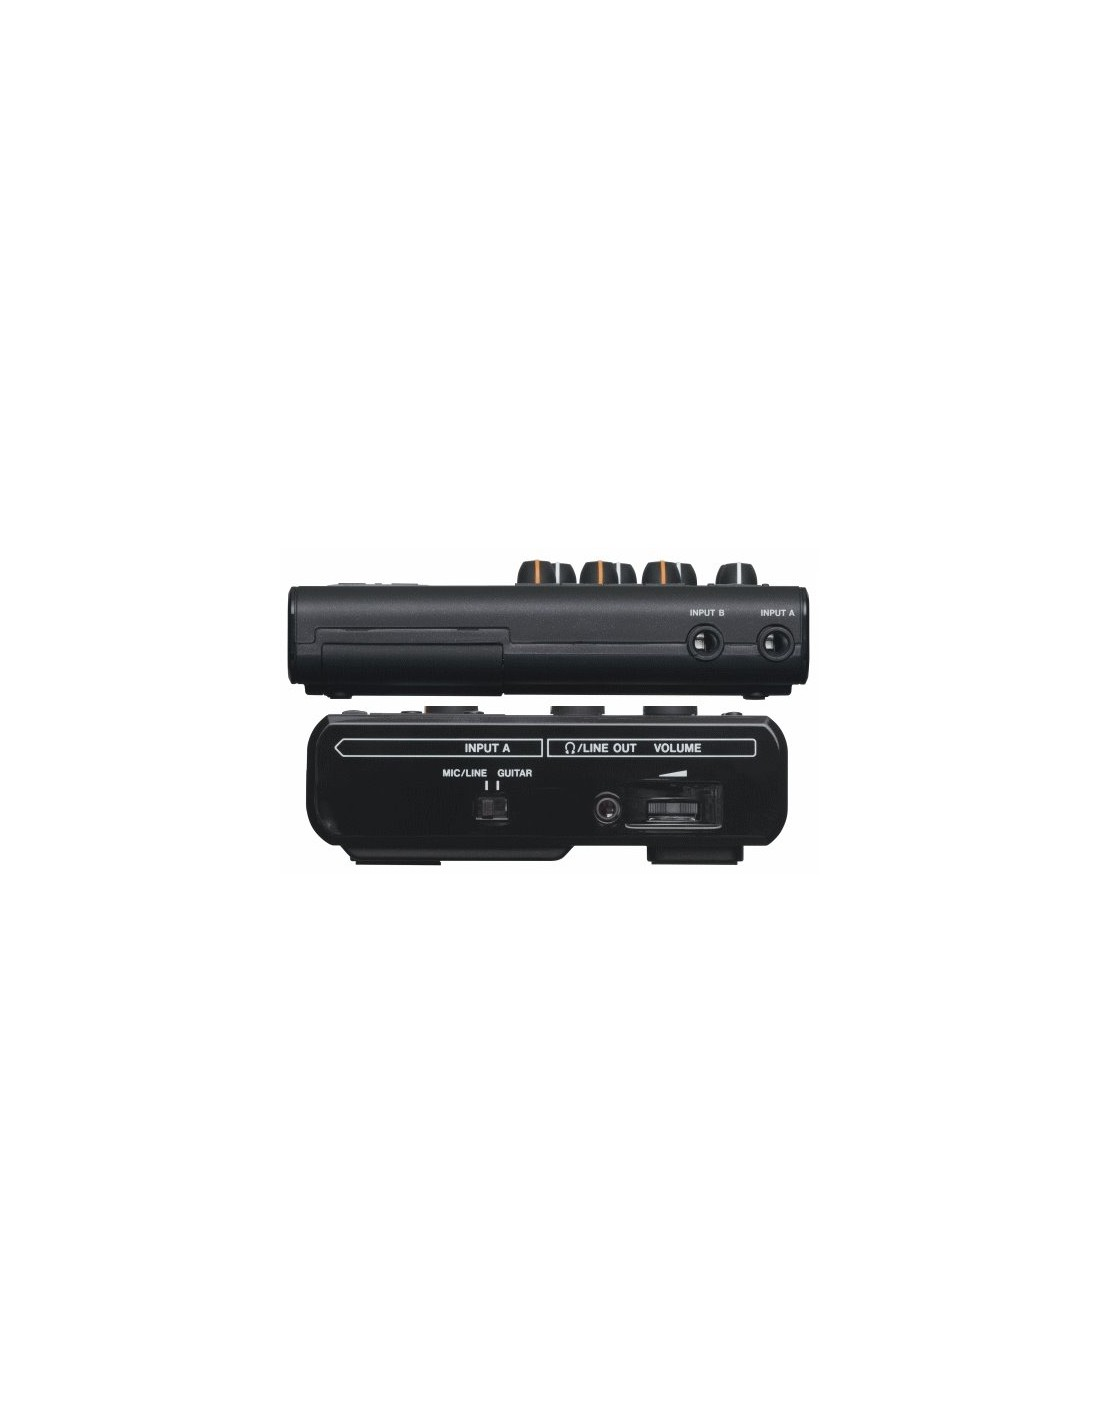 Tascam DP-006 Portable Multitrack Pocketstudio